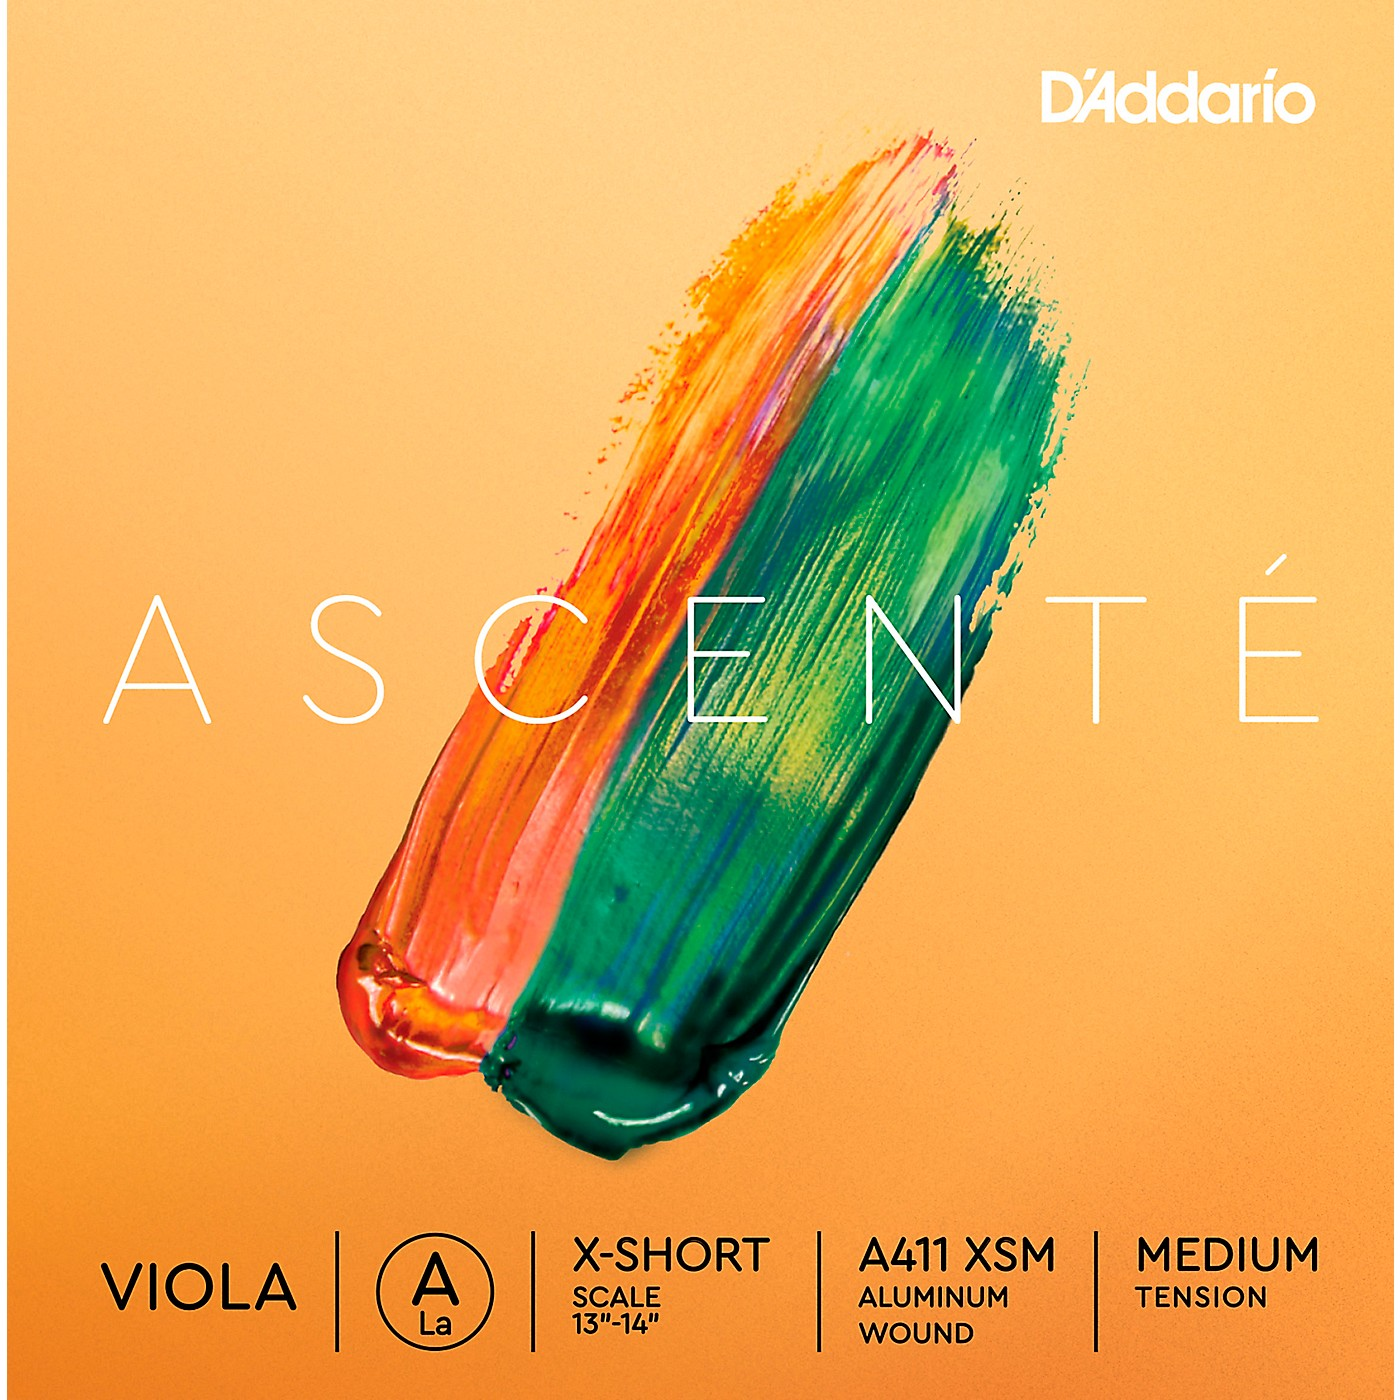 D'Addario Ascente Viola String Set, Medium Tension thumbnail